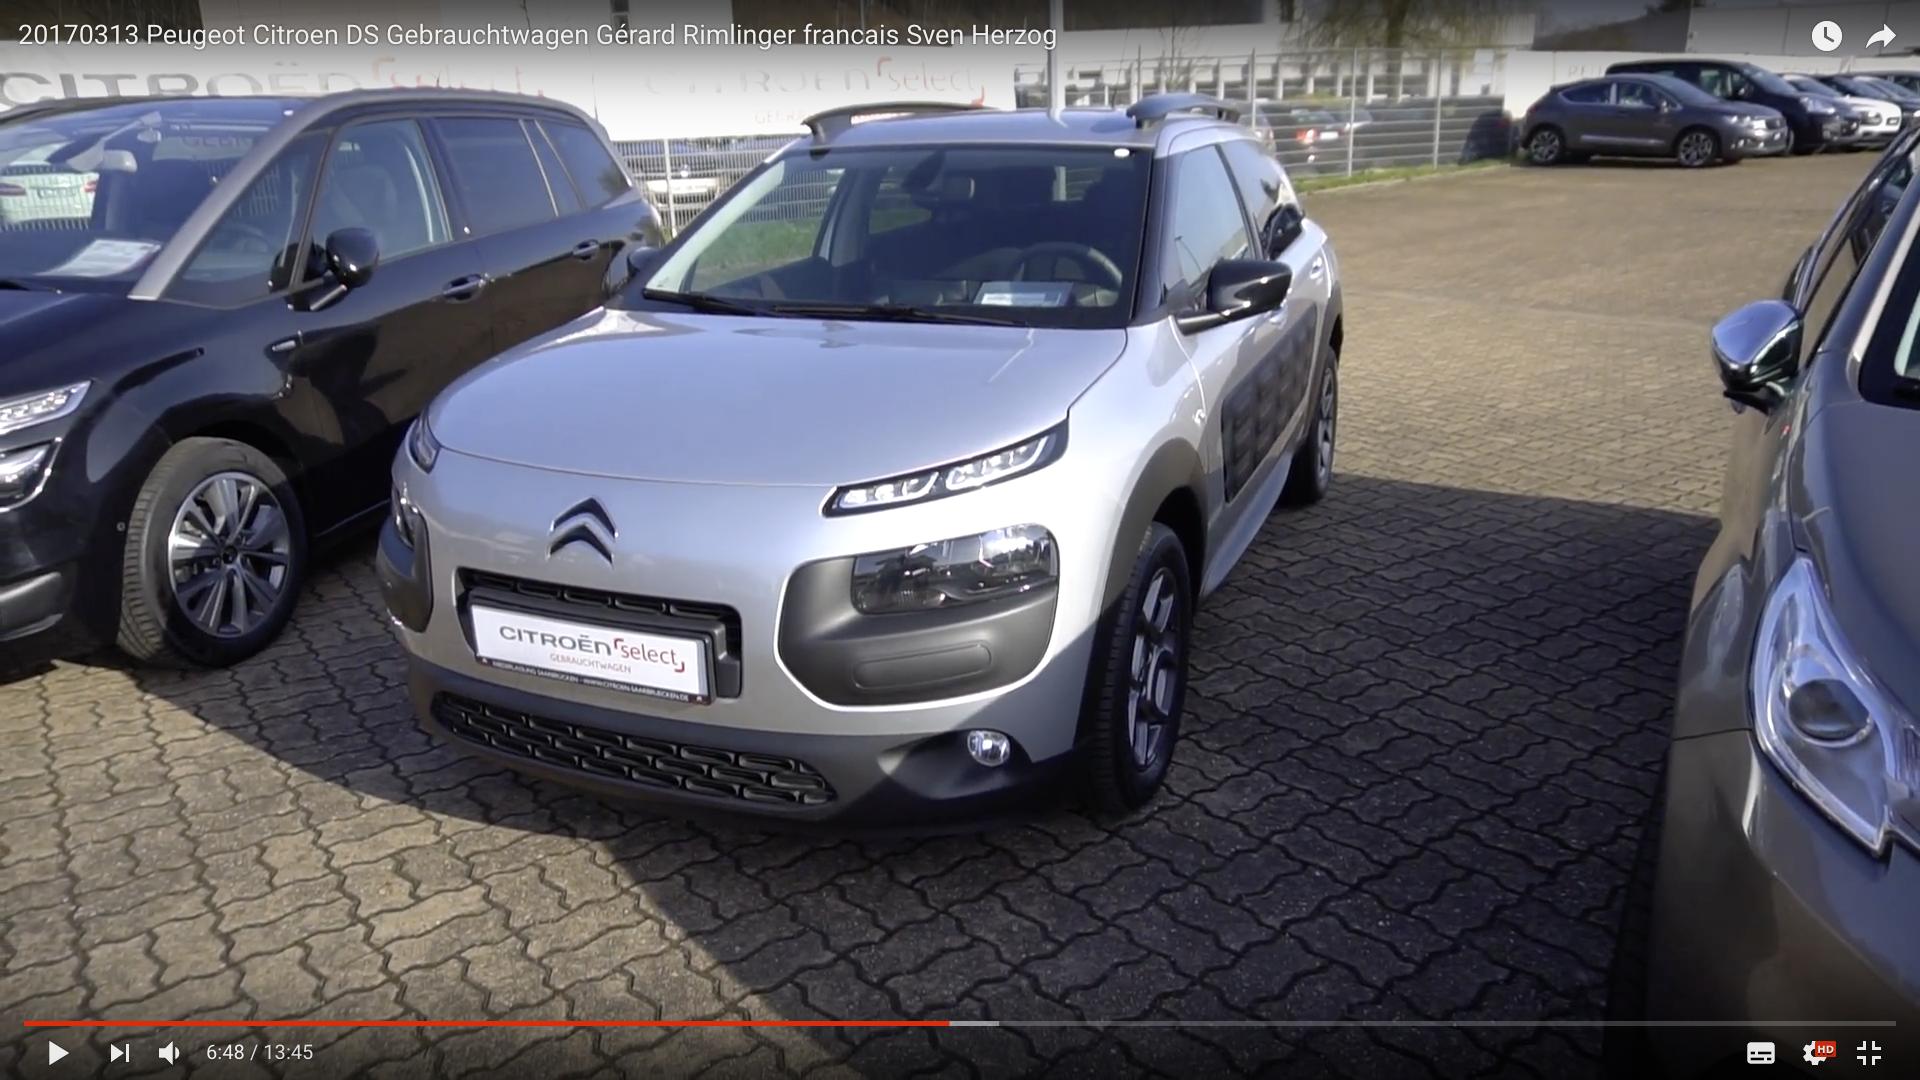 2017 Peugeot Citroen DS Gebrauchtwagen Kaktus _MSM_MEDIEN_SAAR_MOSEL_SAARLAND_FERNSEHEN_1_ED_SAAR